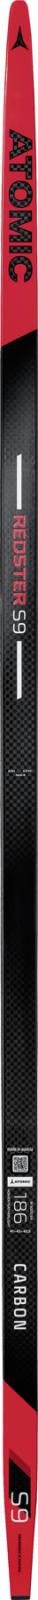 Atomic Redster S9 Carbon Universal X Stiff